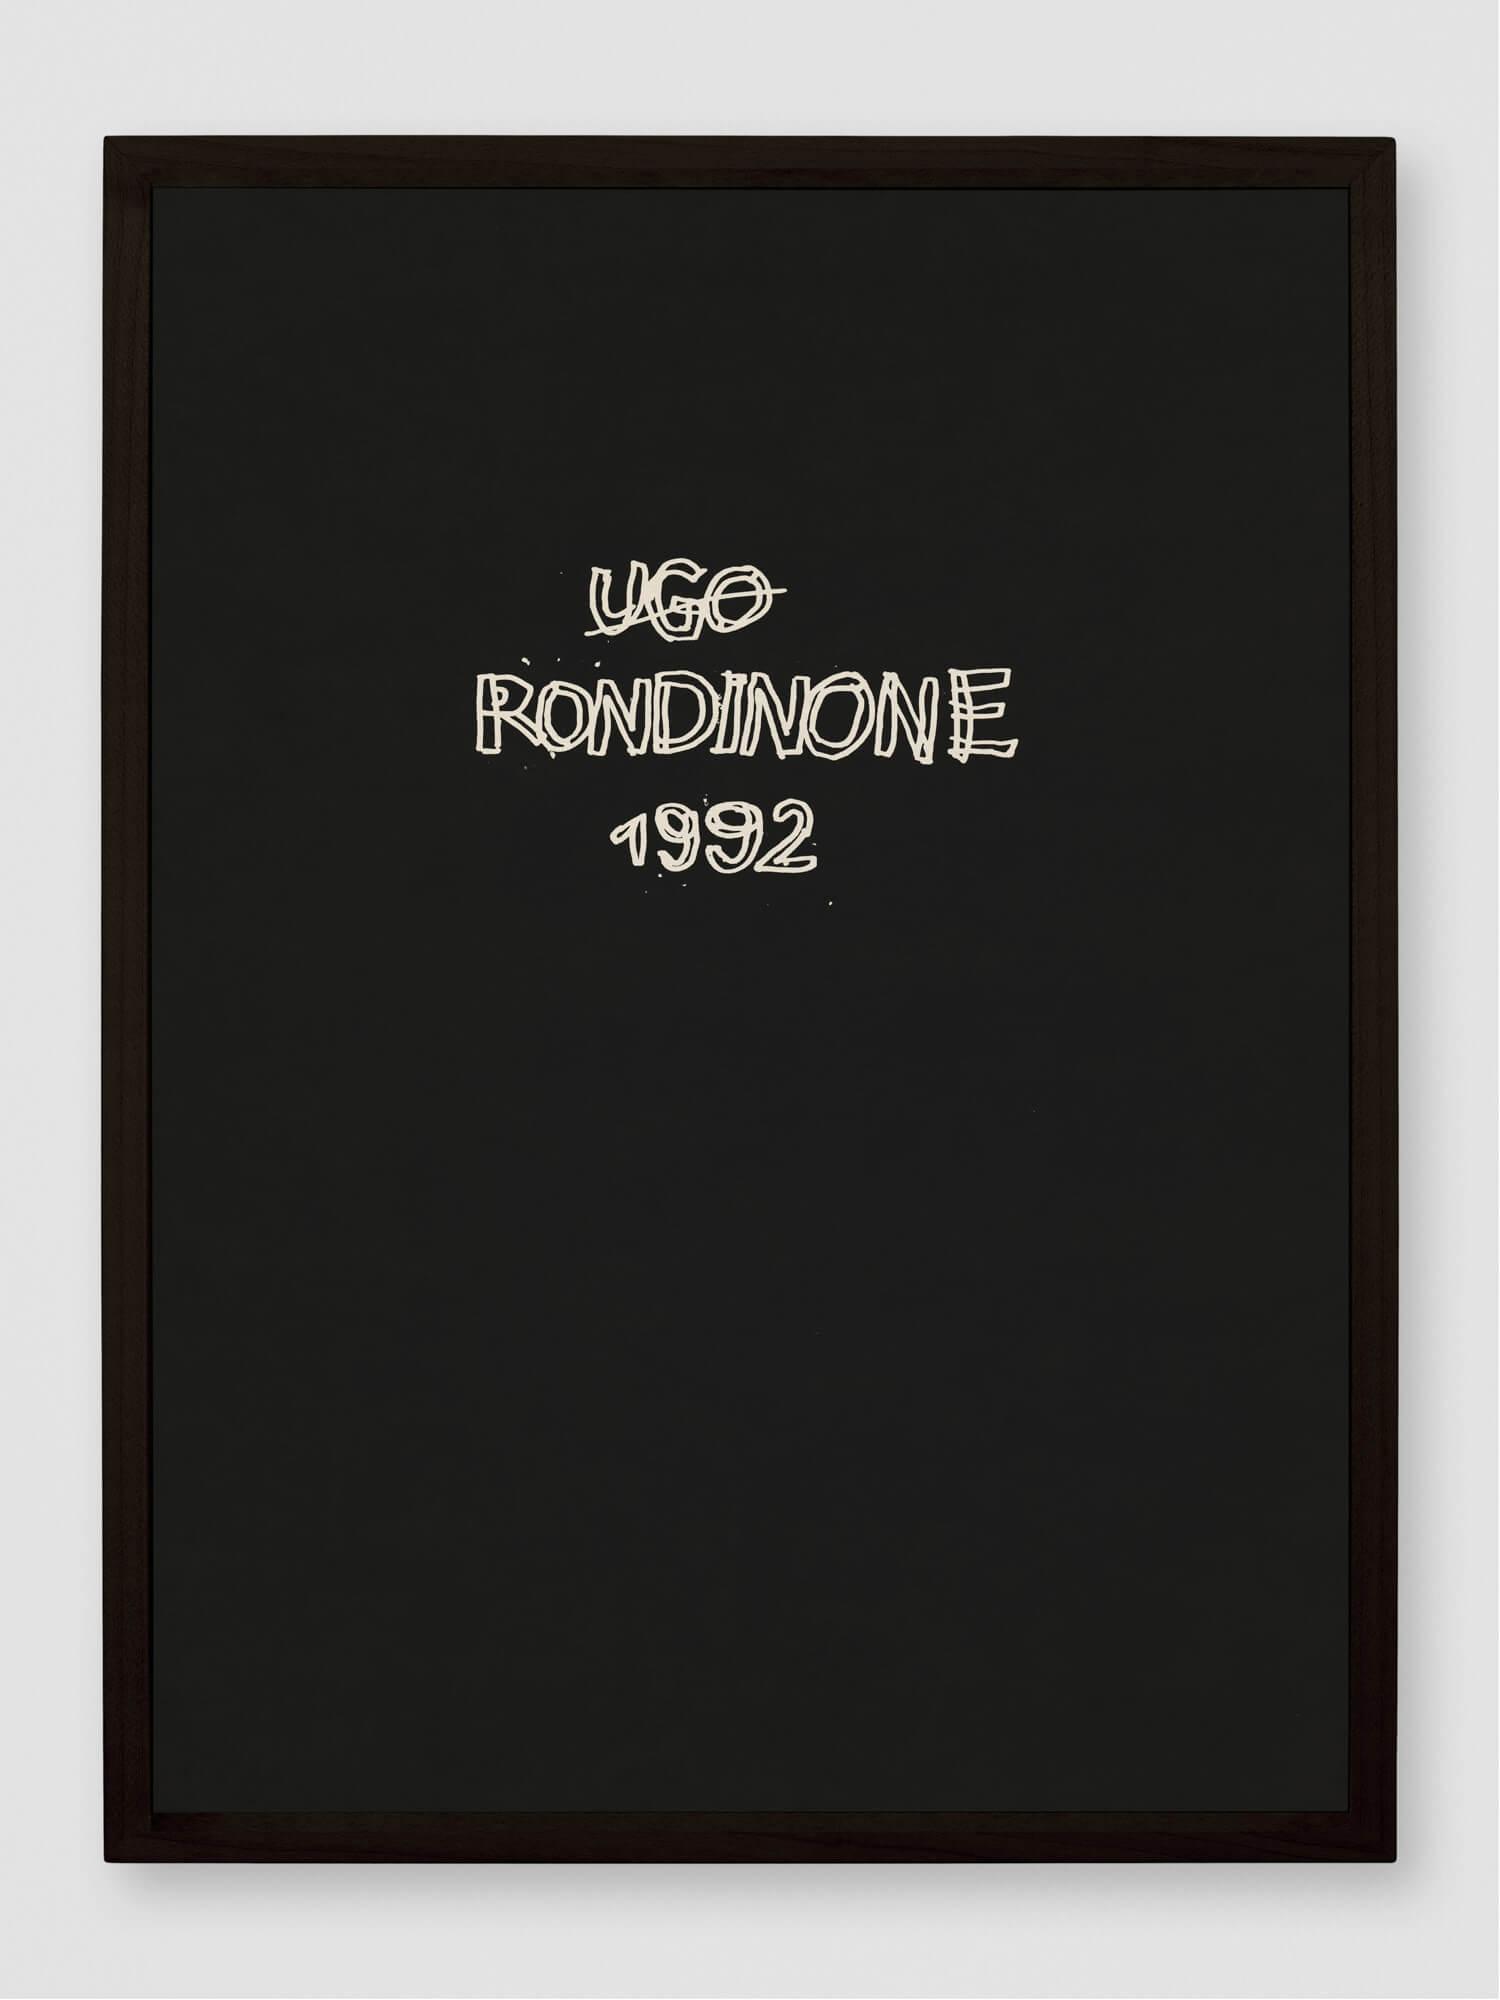 1992 | UGO RONDINONE